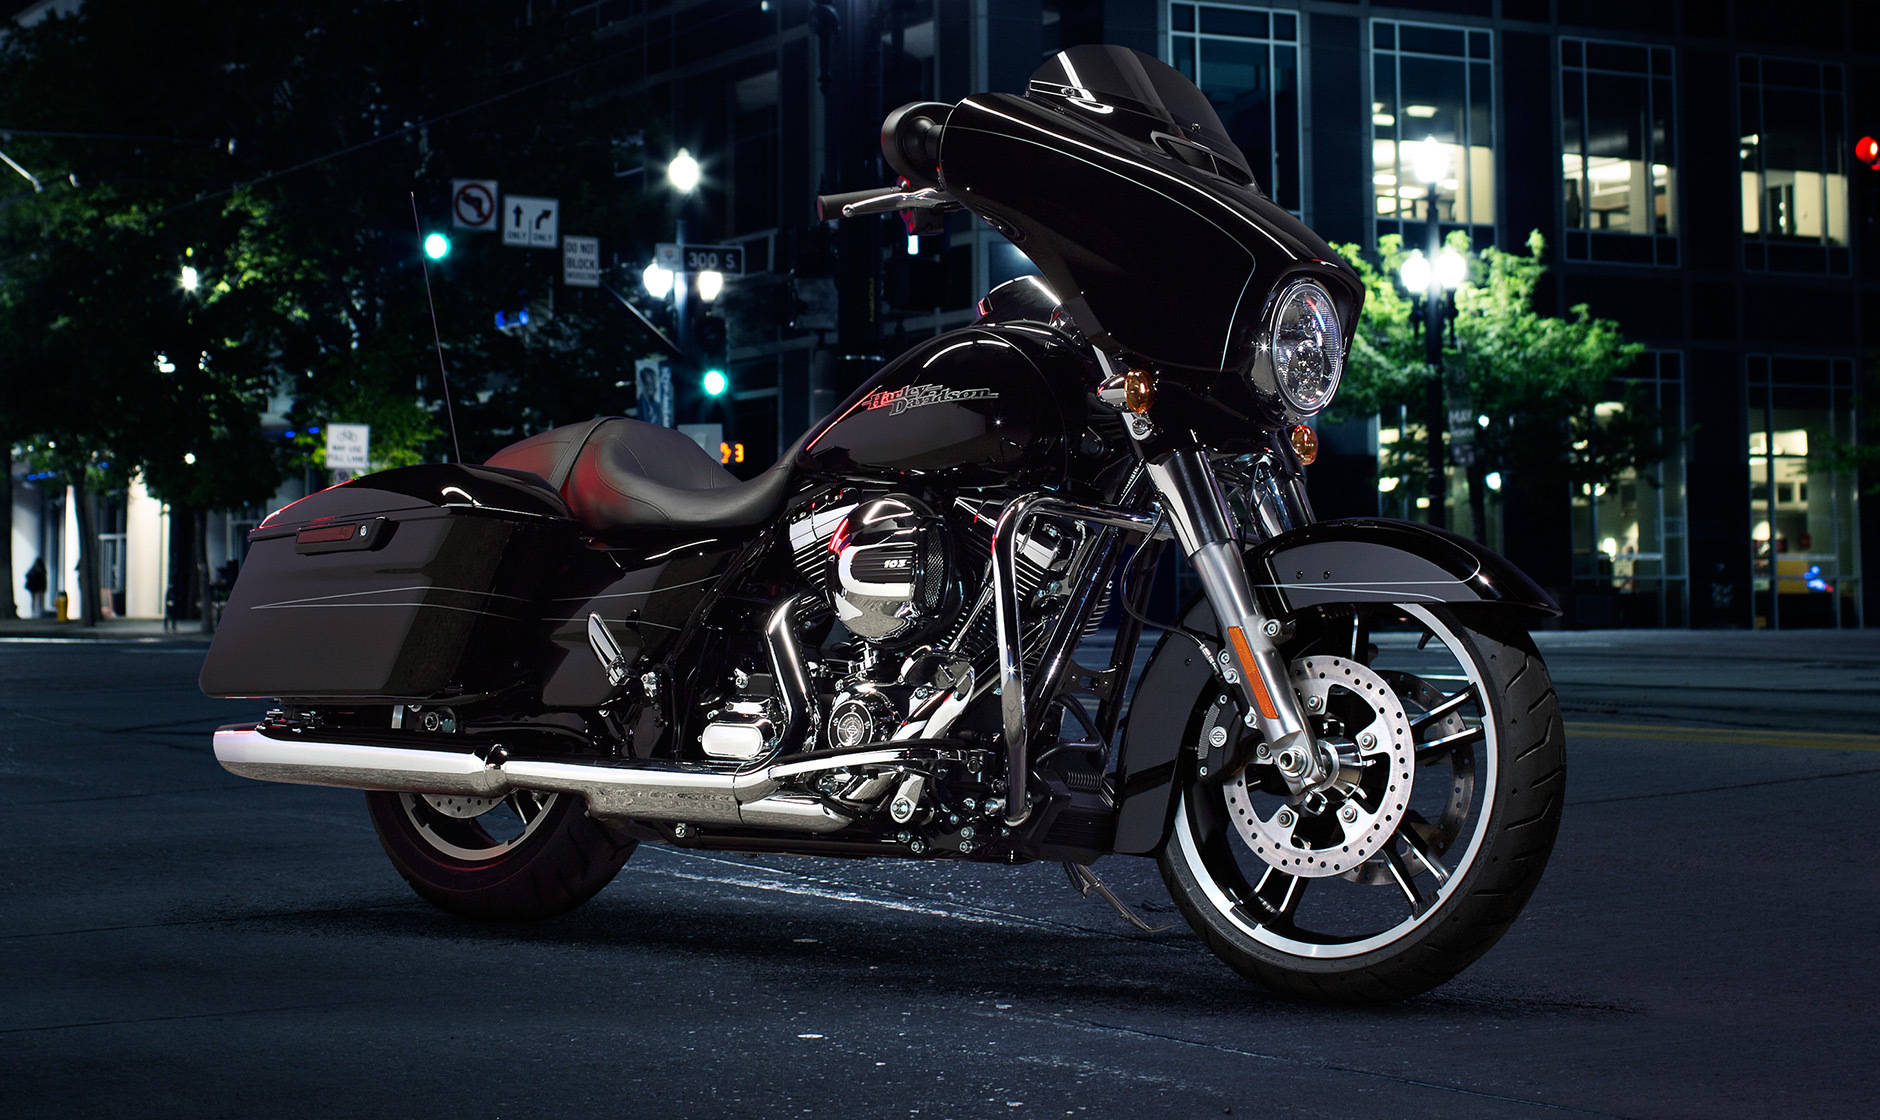 Harley Davidson Street Glide Special Price Mileage